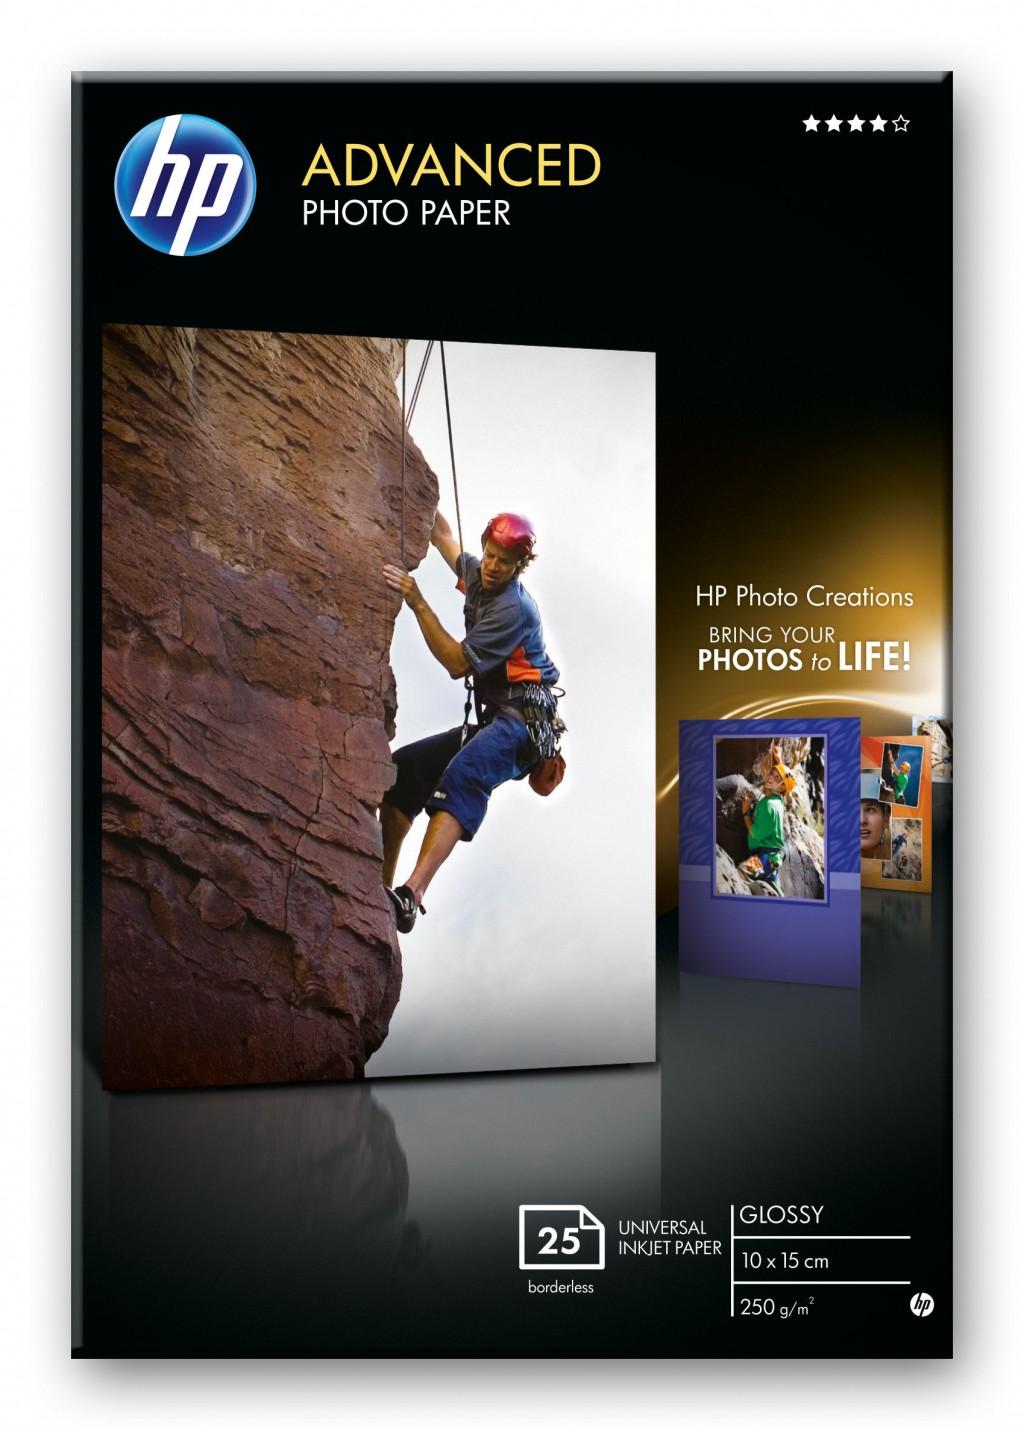 HP Advanced Photo Paper glossy 25sheet